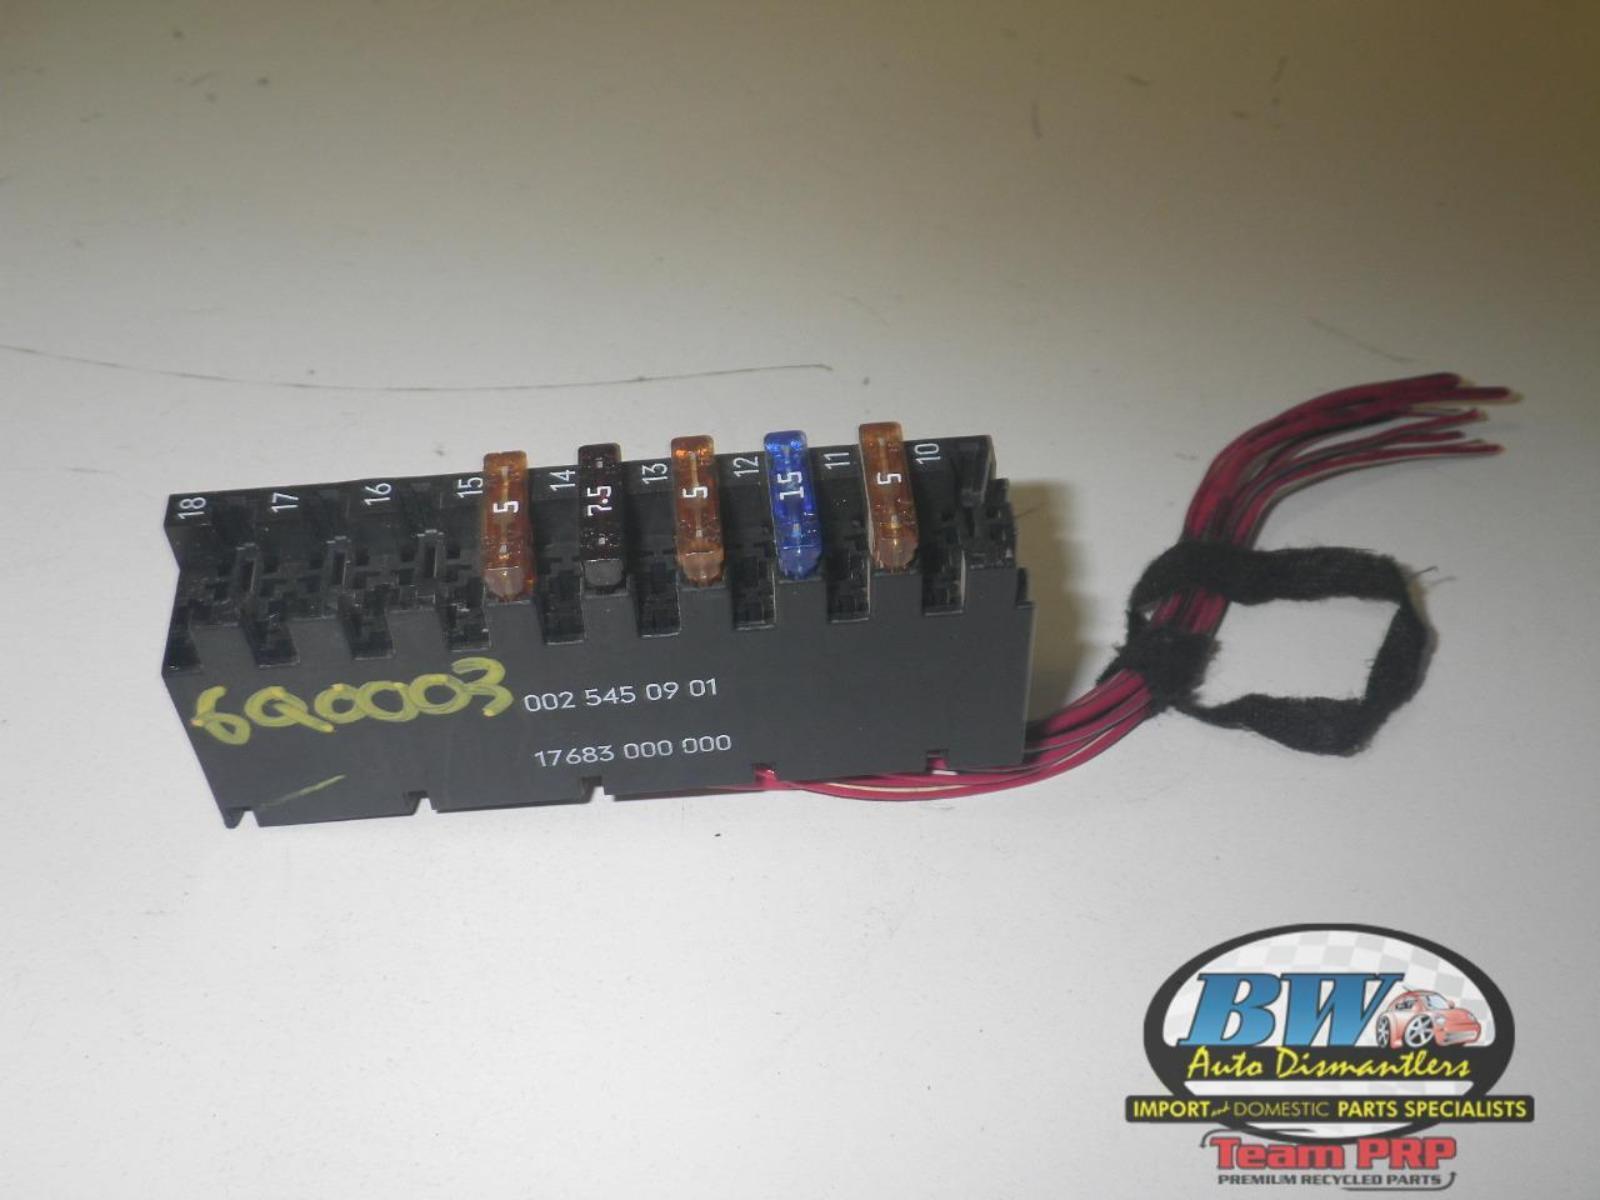 0025450901  Fuse Box  Oem Mercedes Clk320 Clk430 Clk500 Gl450 Gl550 Fuse Box